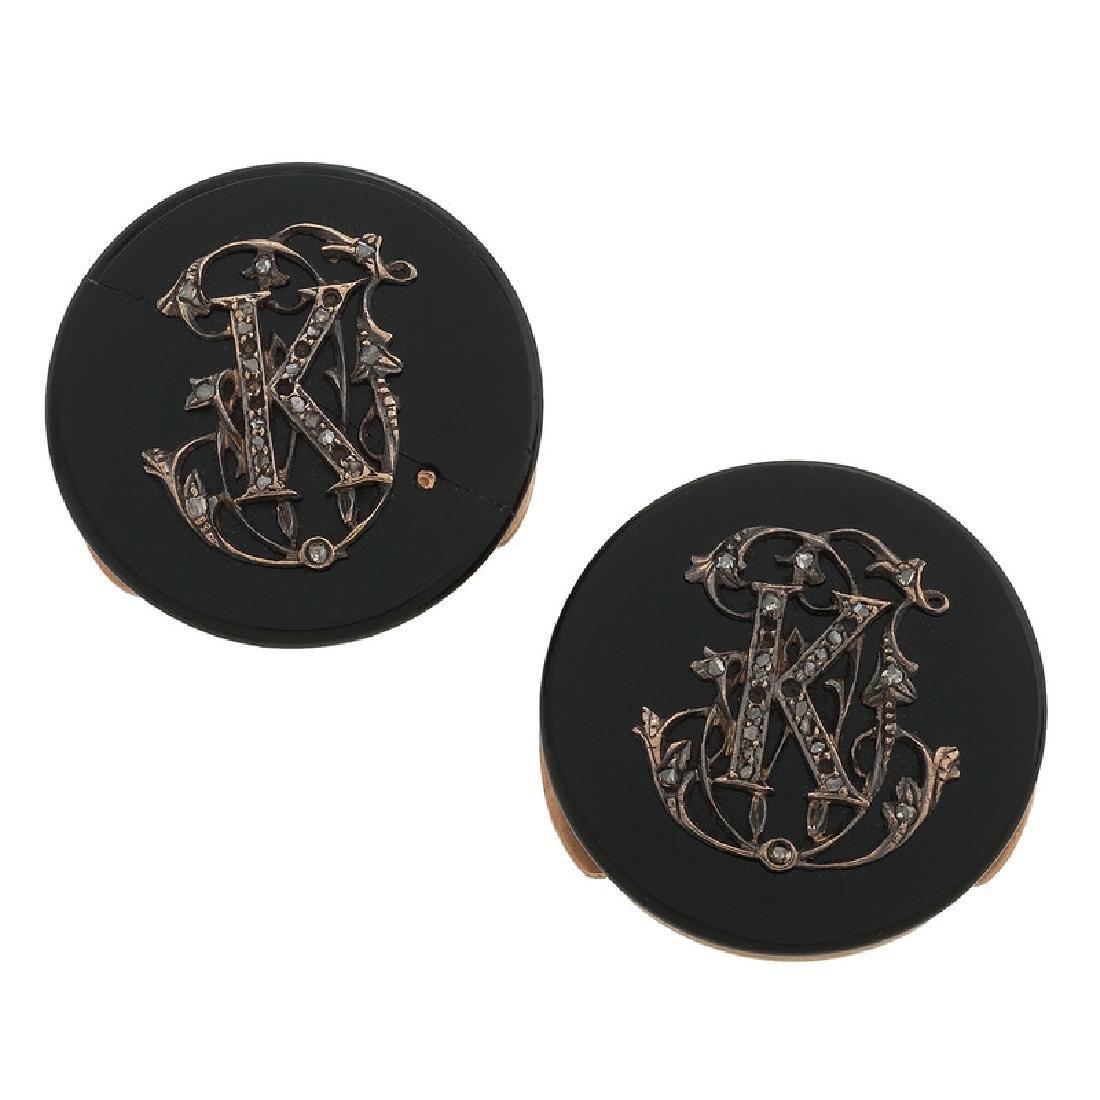 18 Karat Gold Victorian Button Covers